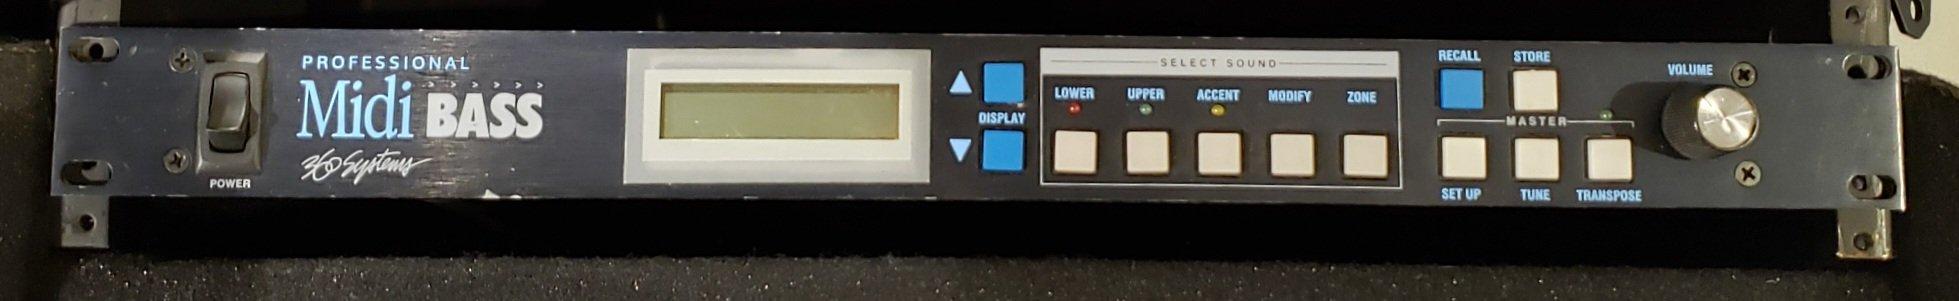 360 SYSTEM PRO MIDI BASS SOUND MODULE, BOX